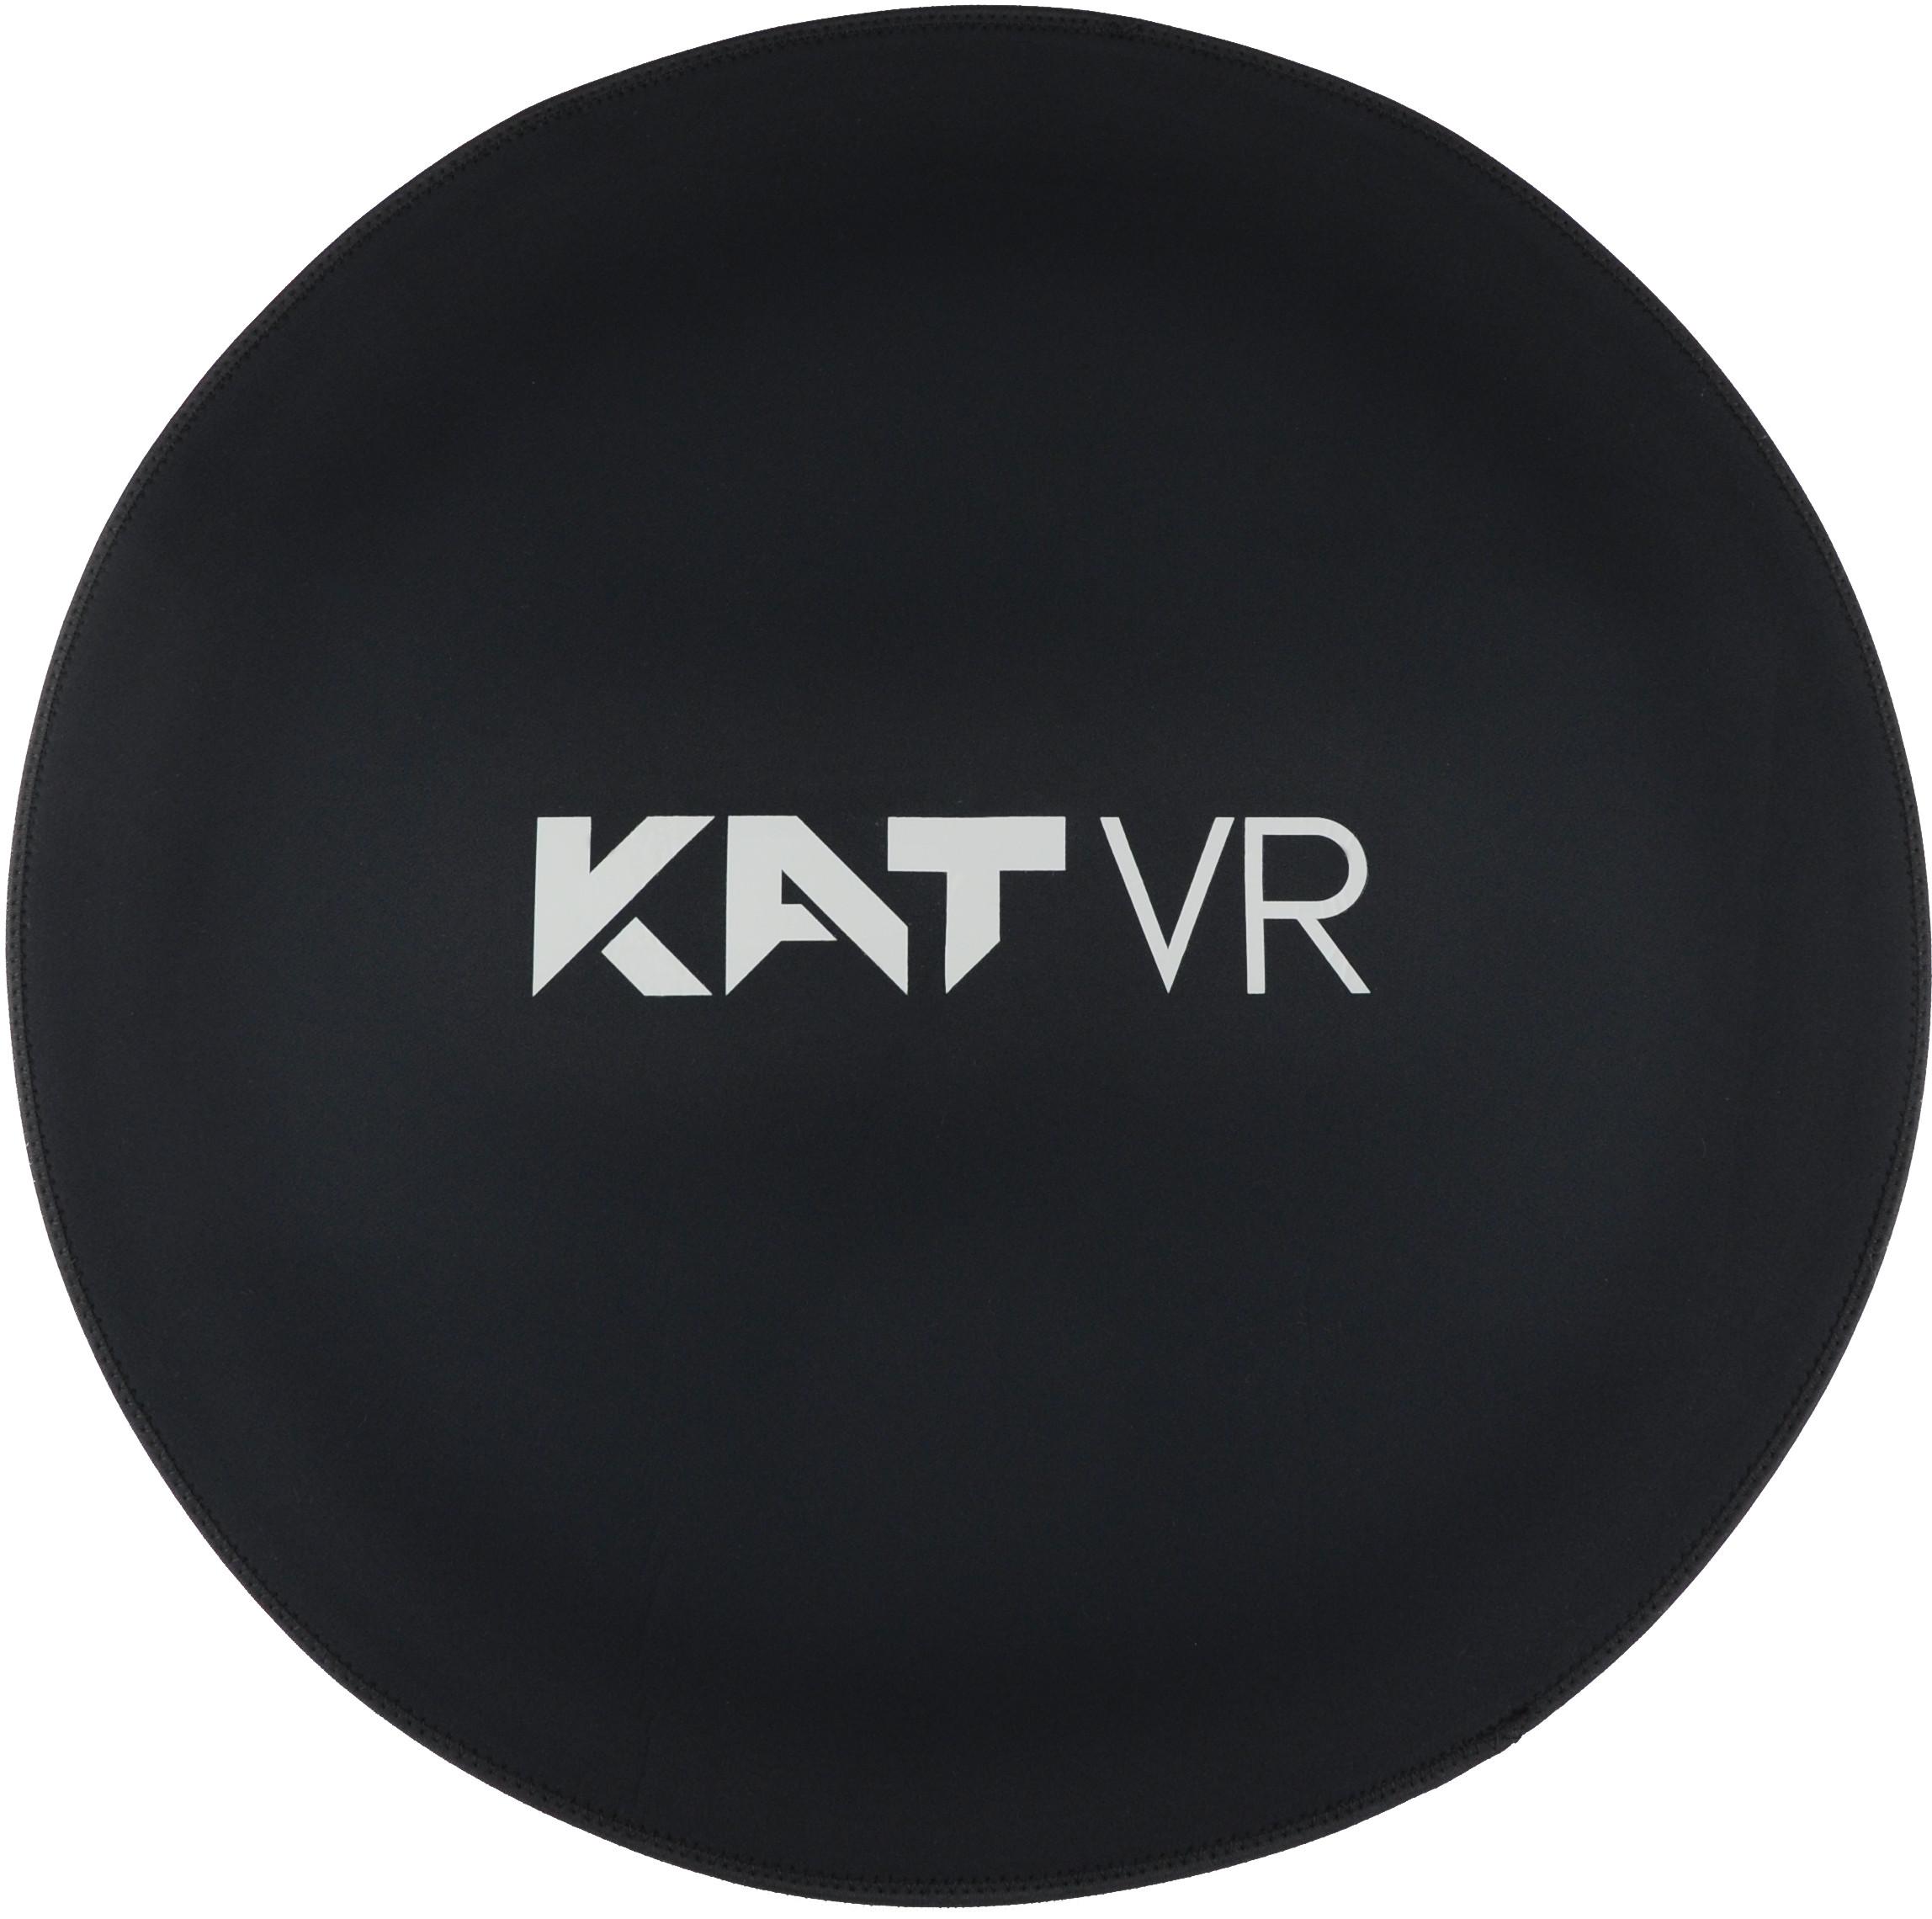 KatVR UPAD Carpet PD01